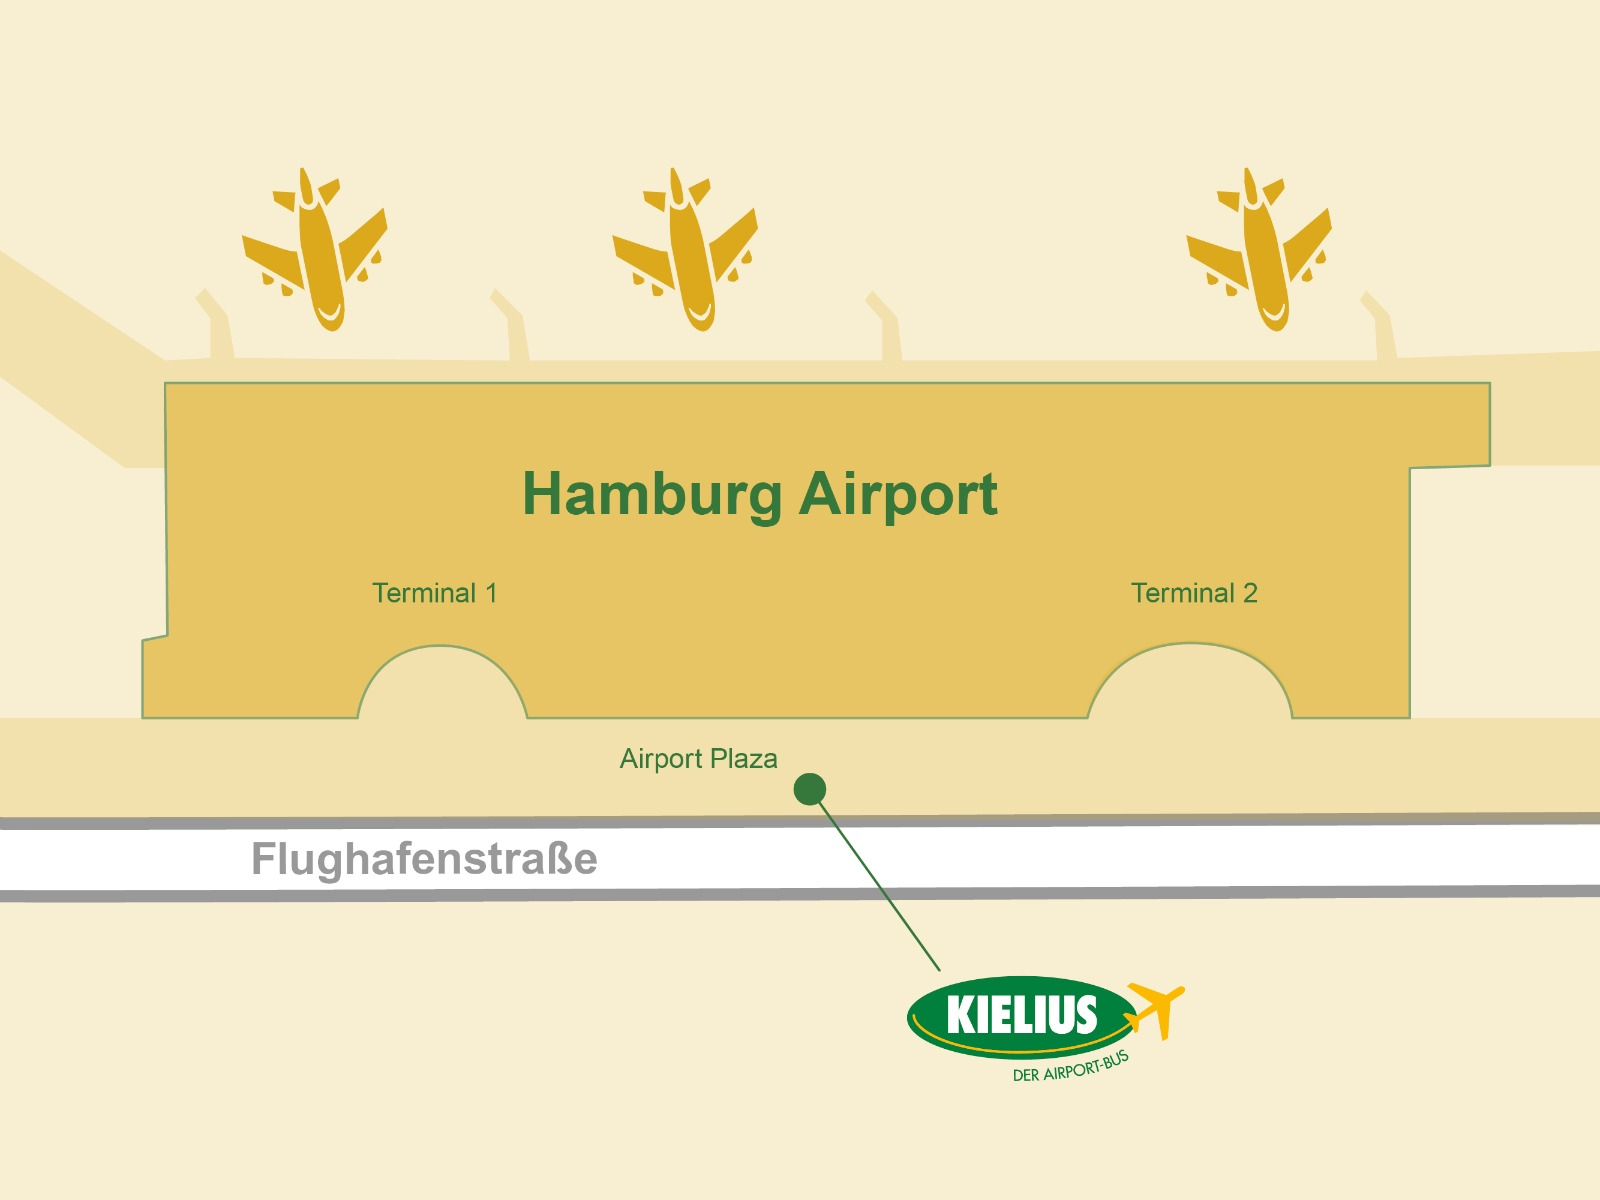 KIELIUS_Hamburg_Airport_600x480_Px_1